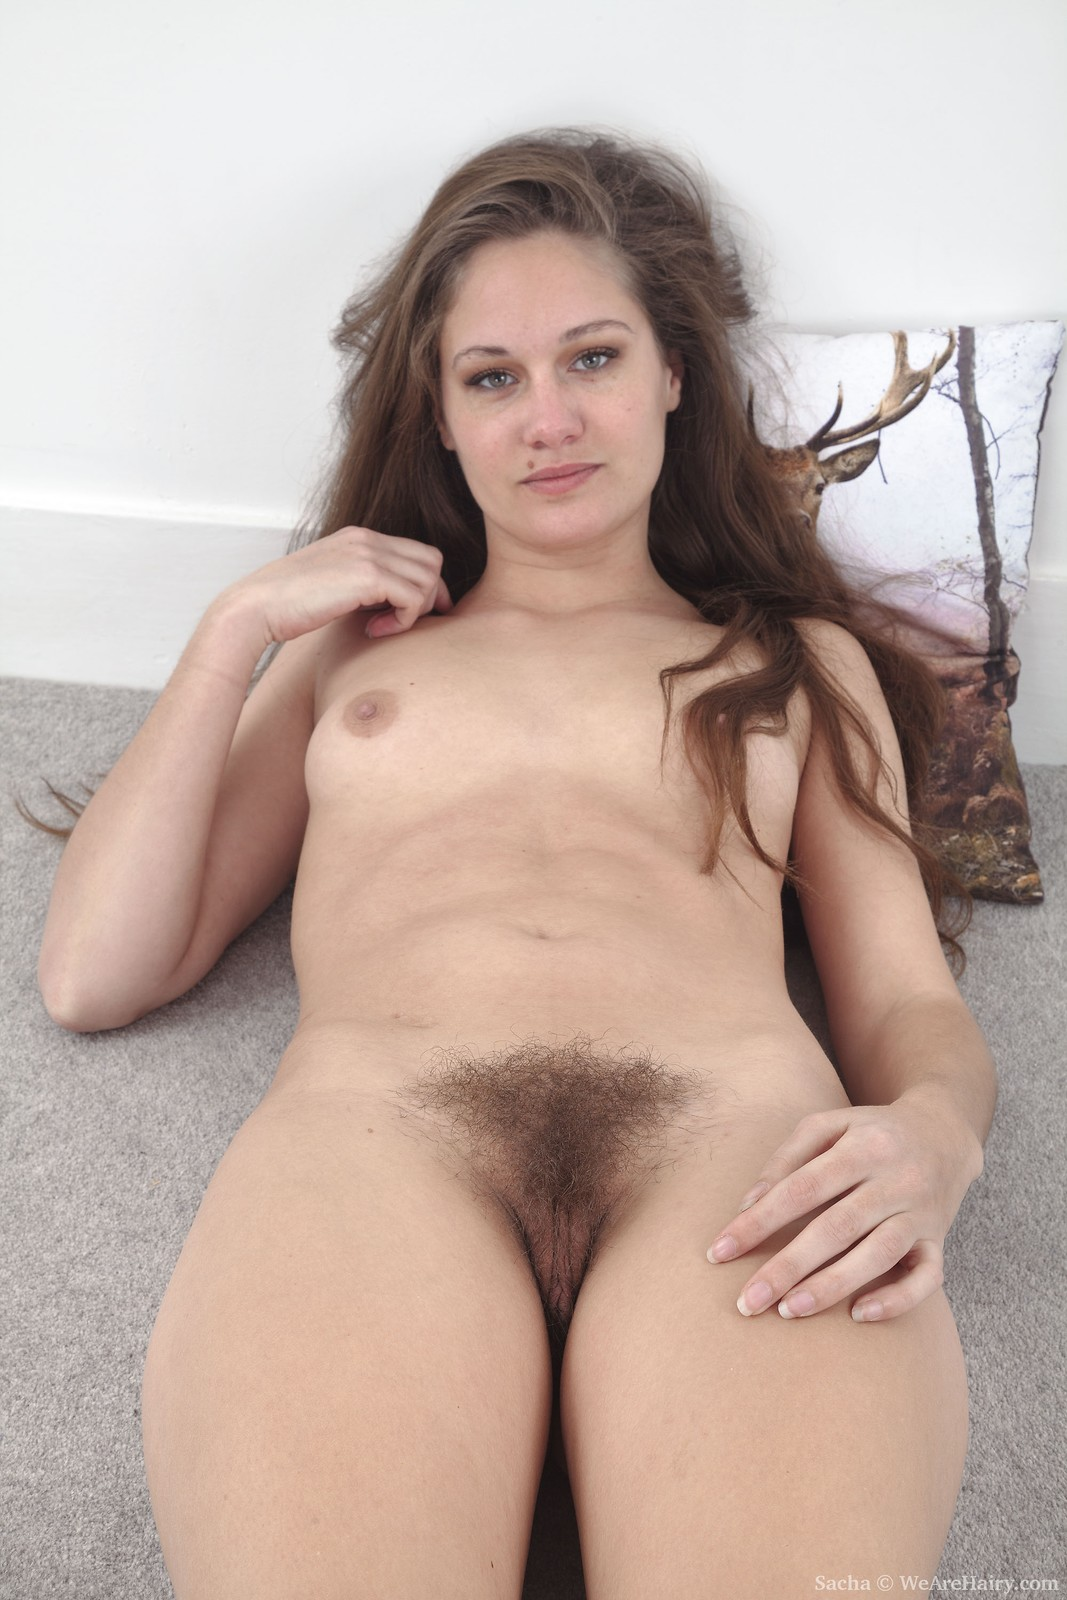 Hairy porn pics Wow Hairy